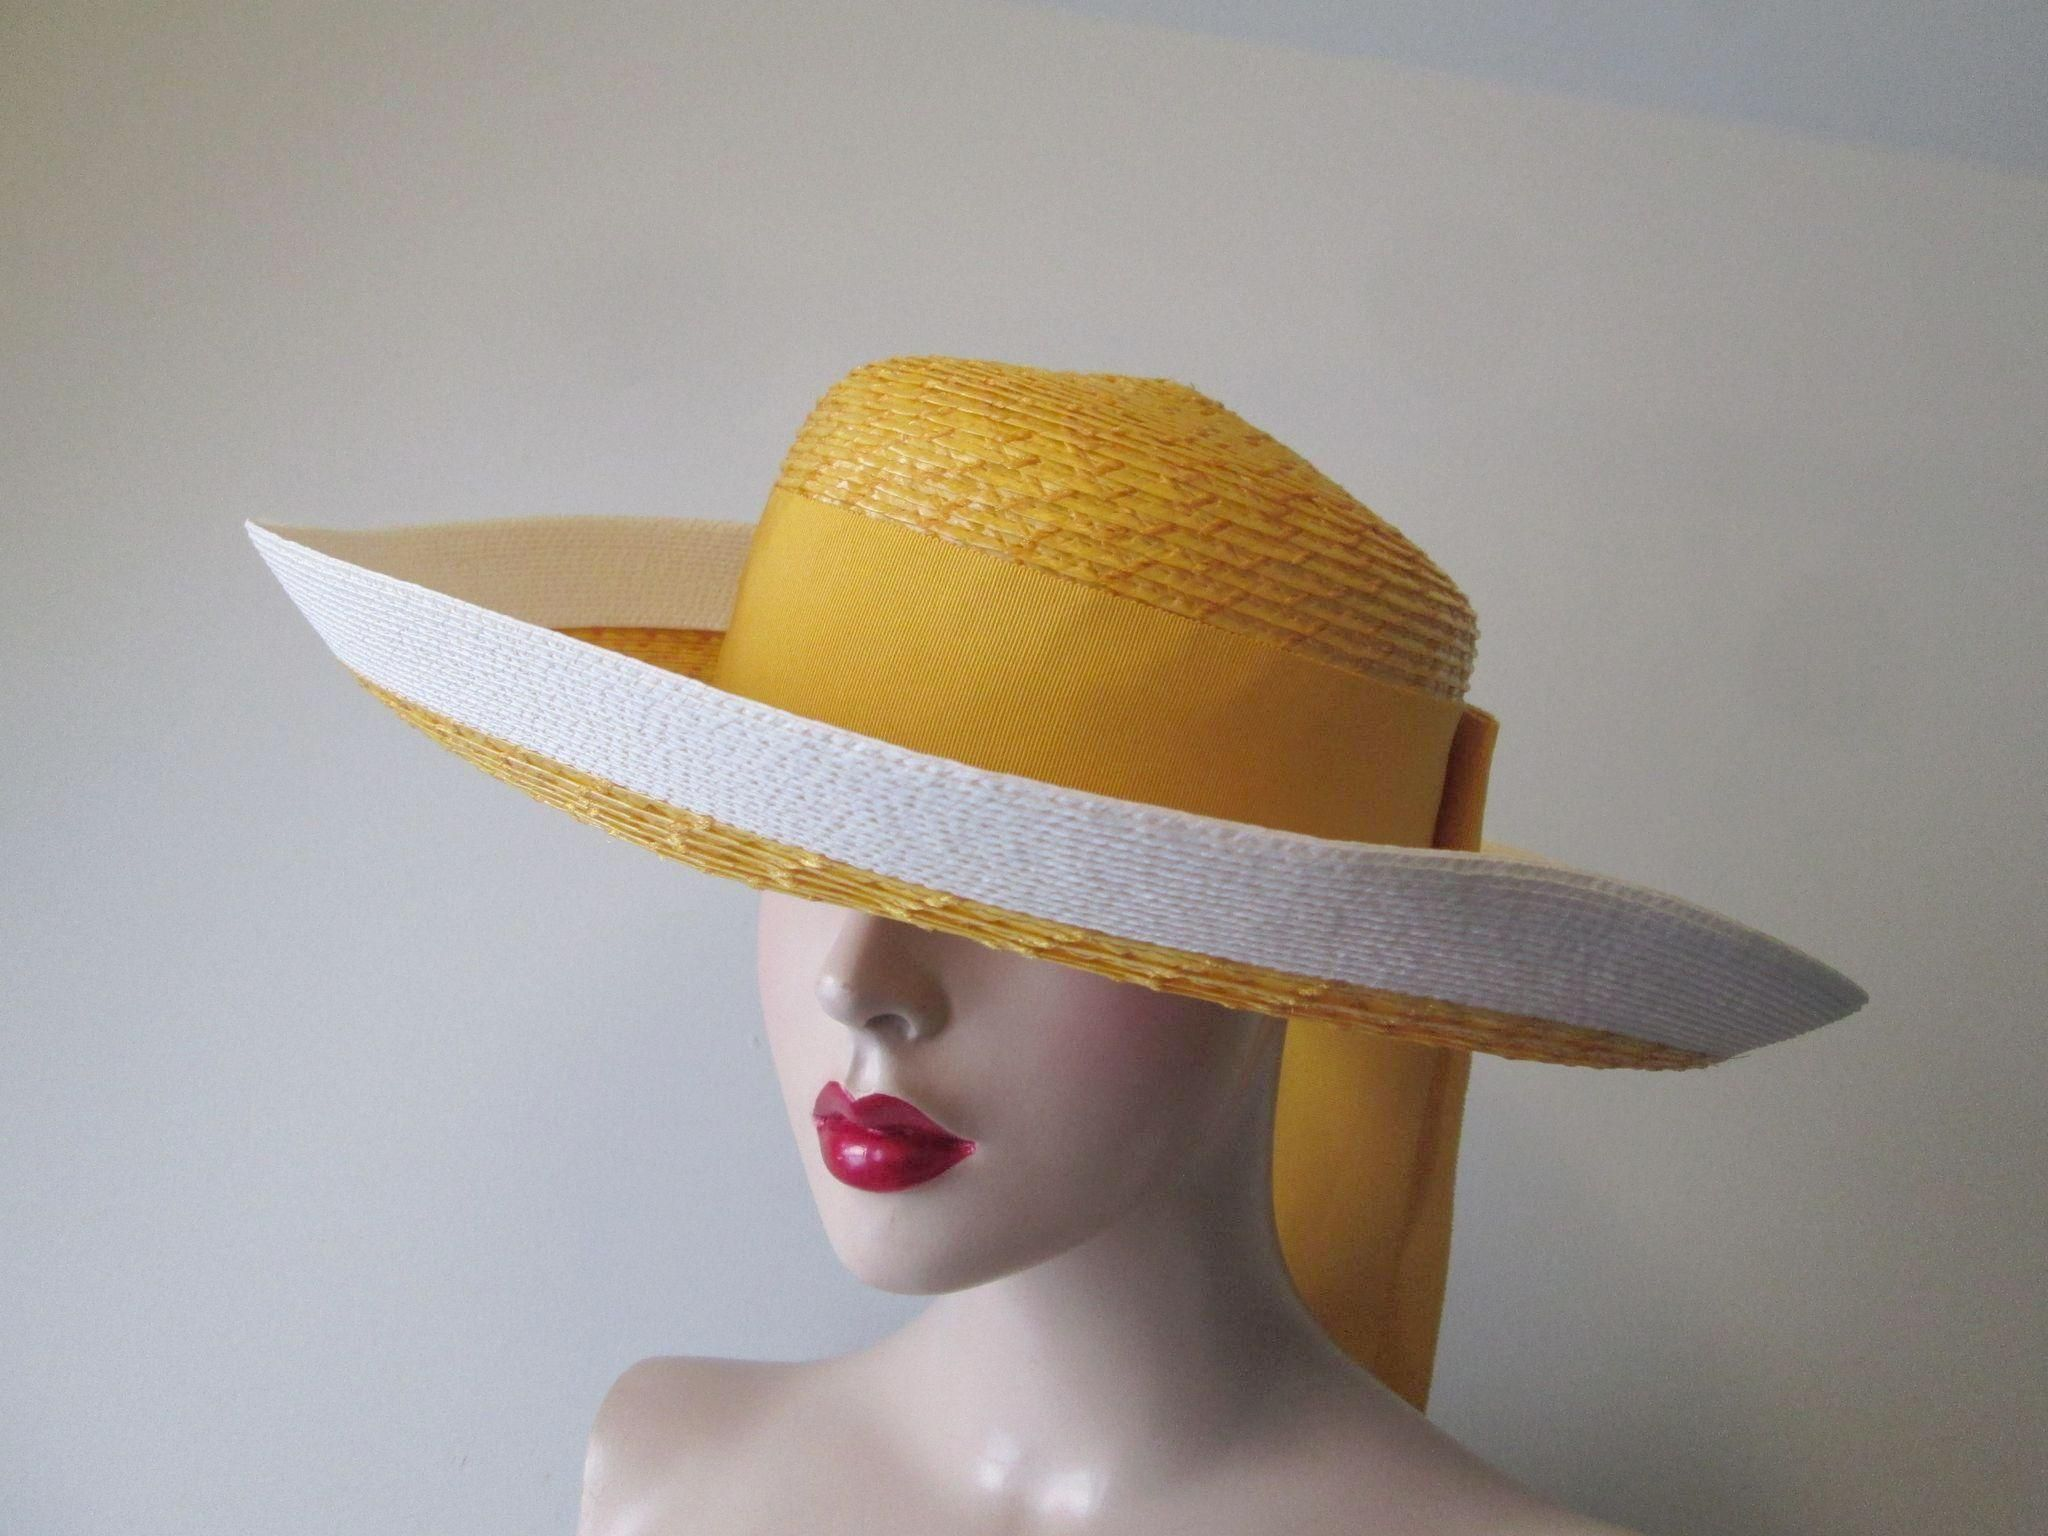 69688b83535 Yves Saint Laurent Sun Hat Vintage 1960s Yellow White Straw Wide Brim